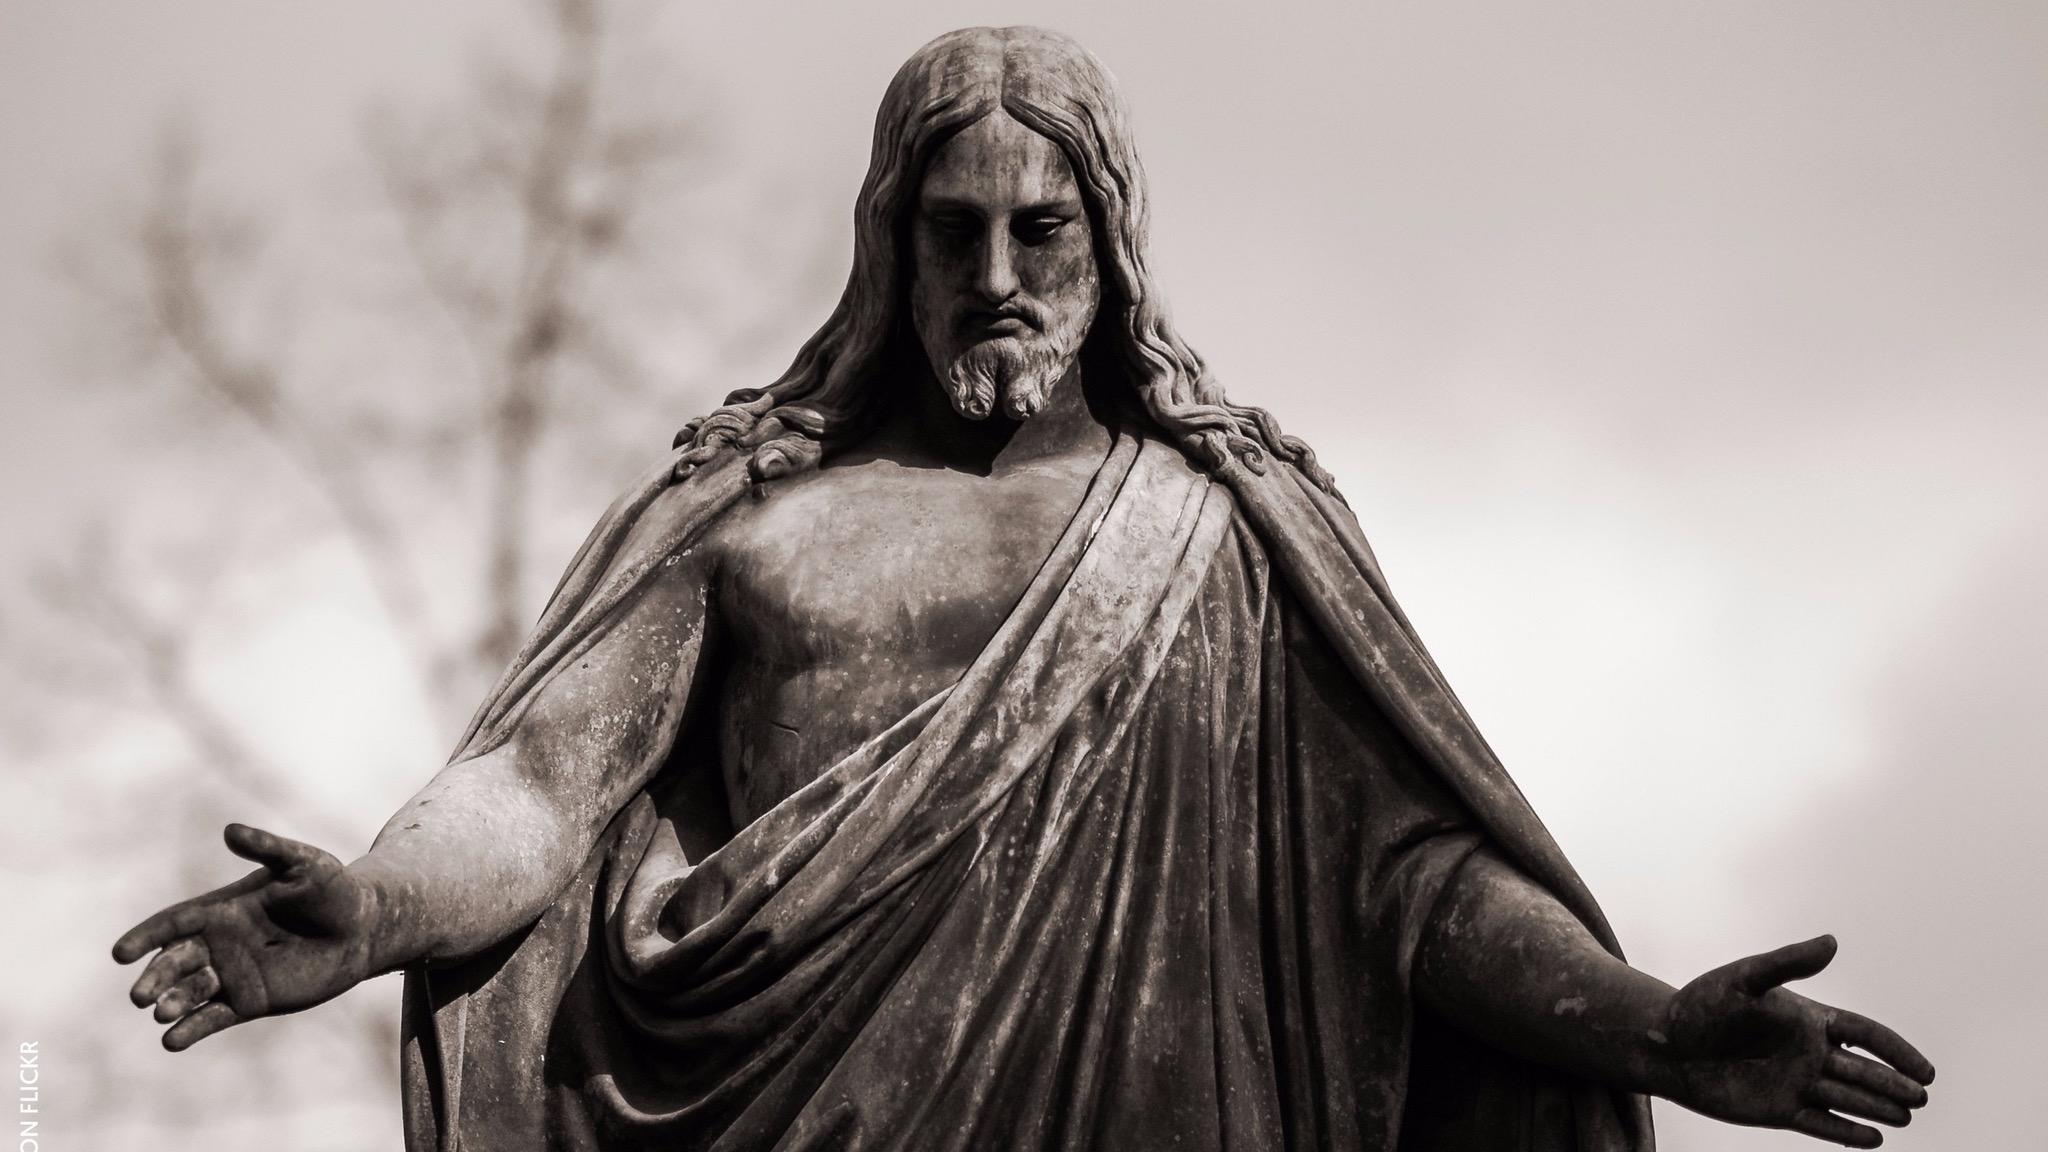 Status of Jesus in the Engesohde Cemetery, Hannover